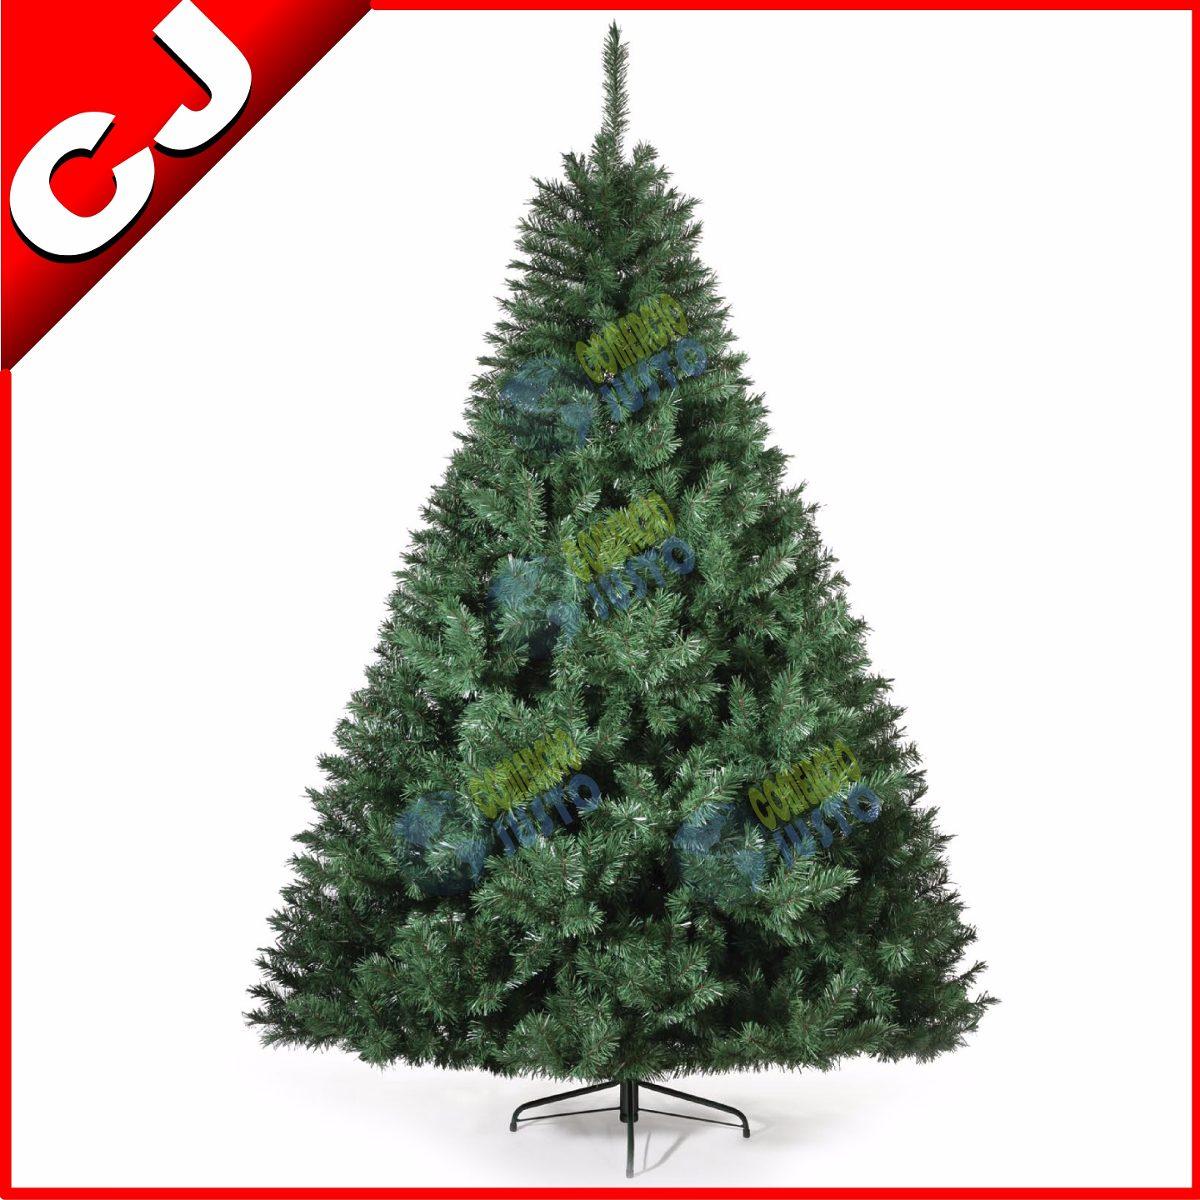 Arbol de navidad 190 verde chestnut pino artificial pachon - Arbol artificial de navidad ...